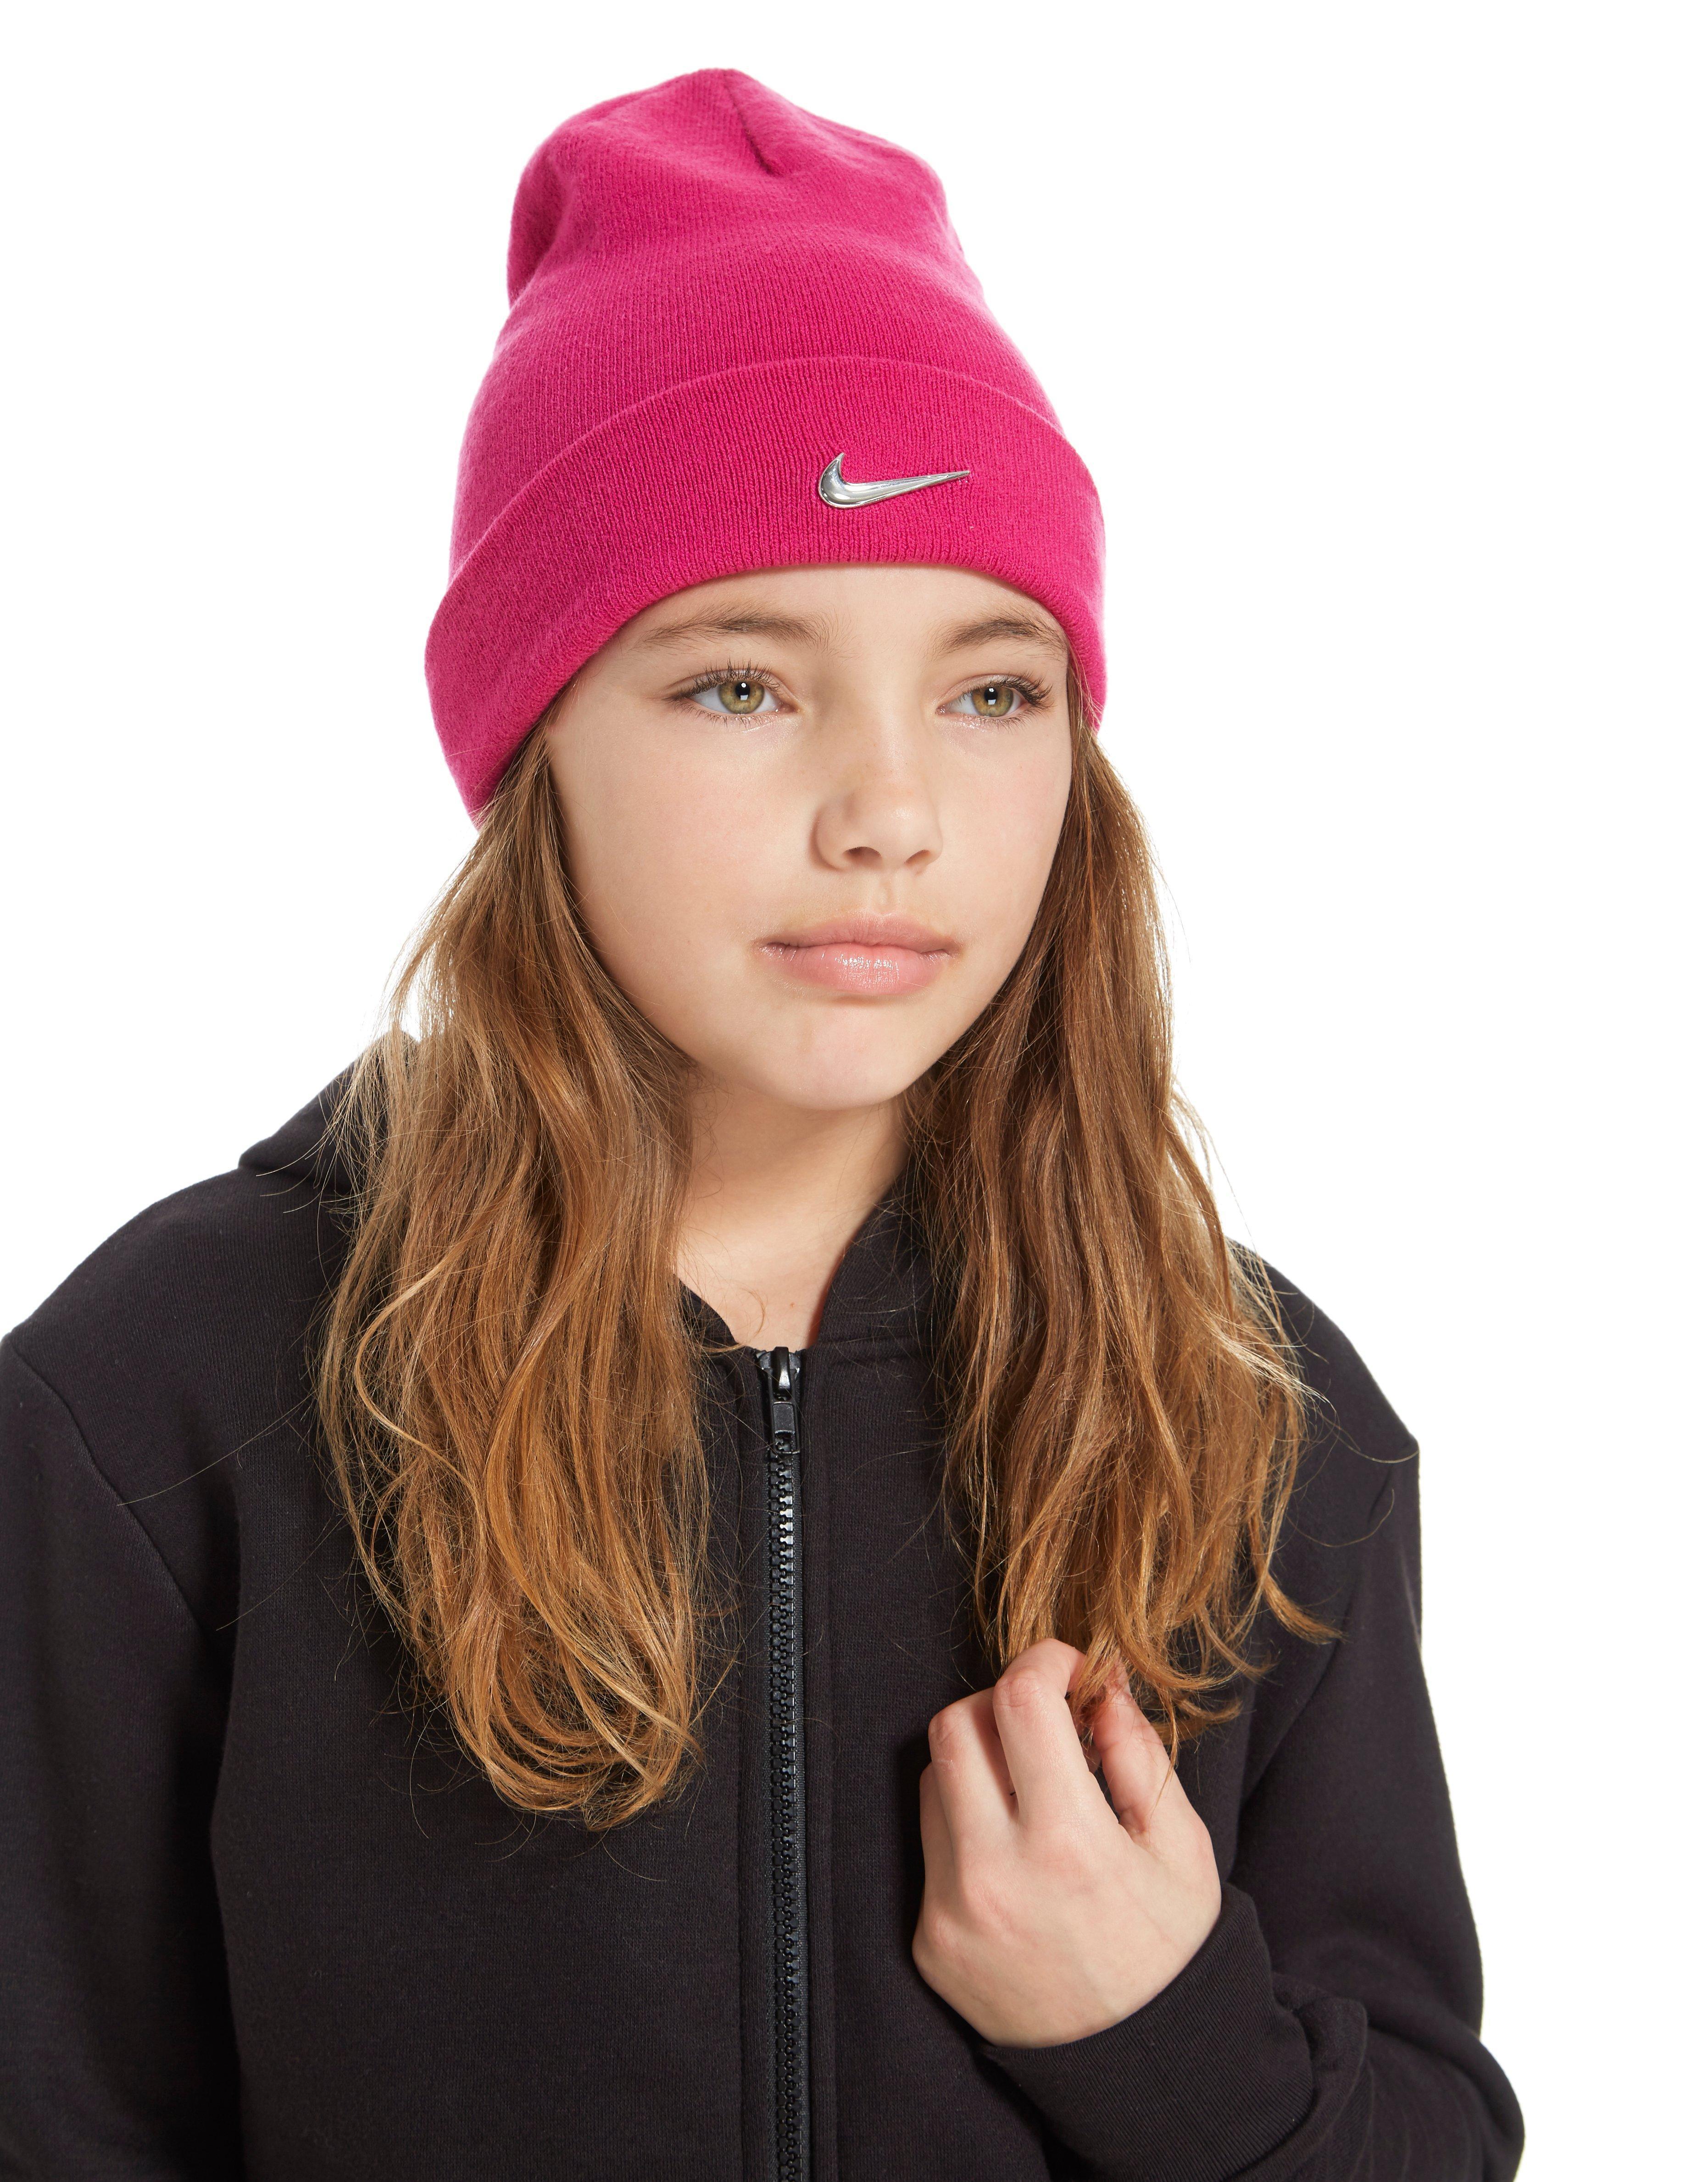 Lyst - Nike Swoosh Beanie Hat in Pink 6bce566fc4e